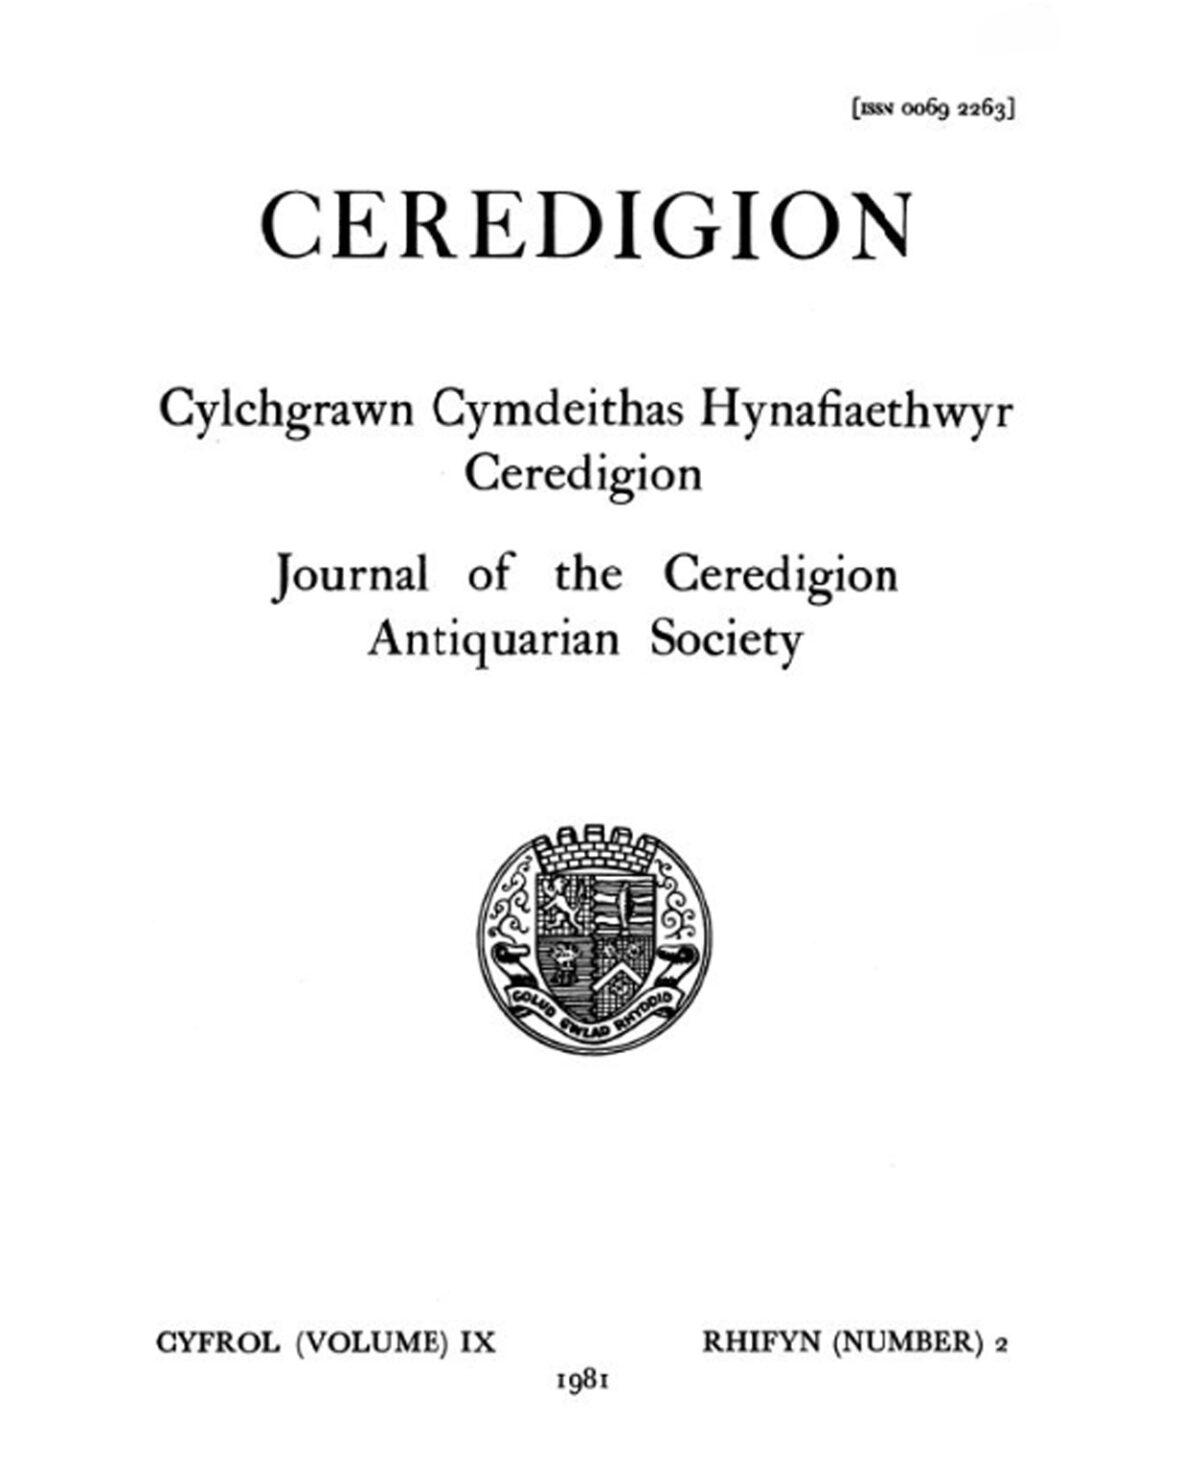 Ceredigion – Journal of the Cardiganshire Antiquarian Society, 1981 Vol IX No 2